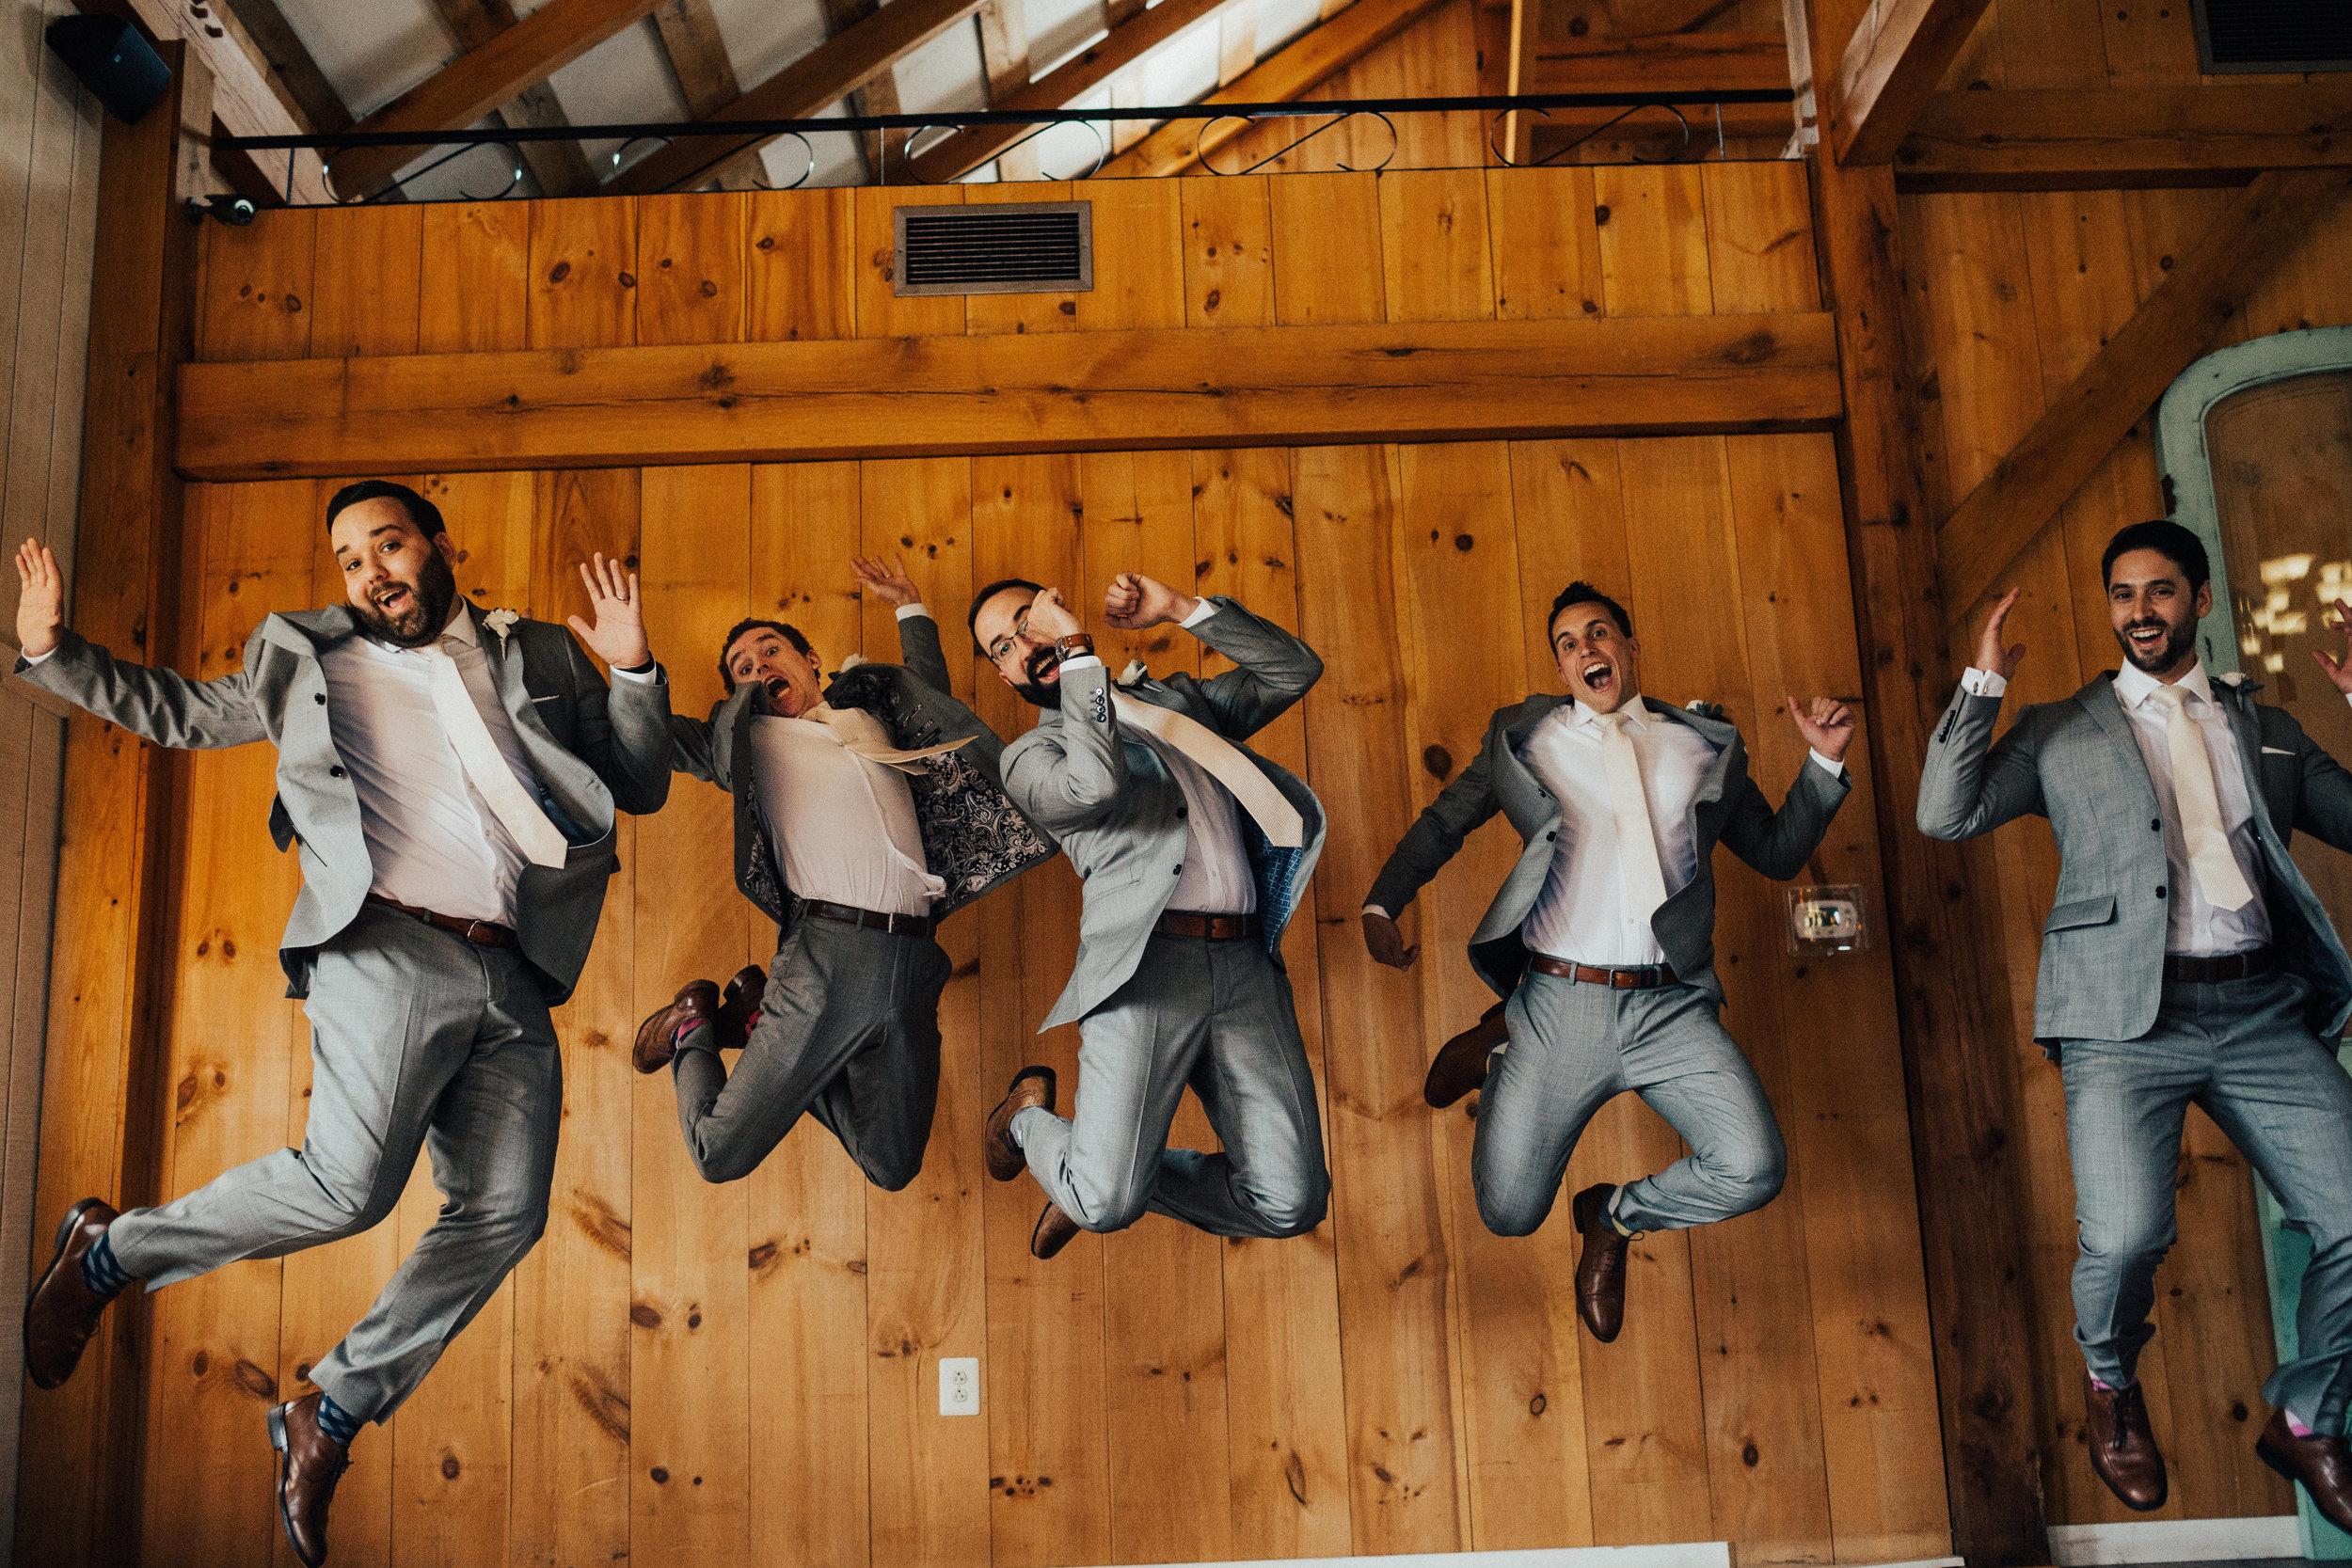 Groomsmen jump